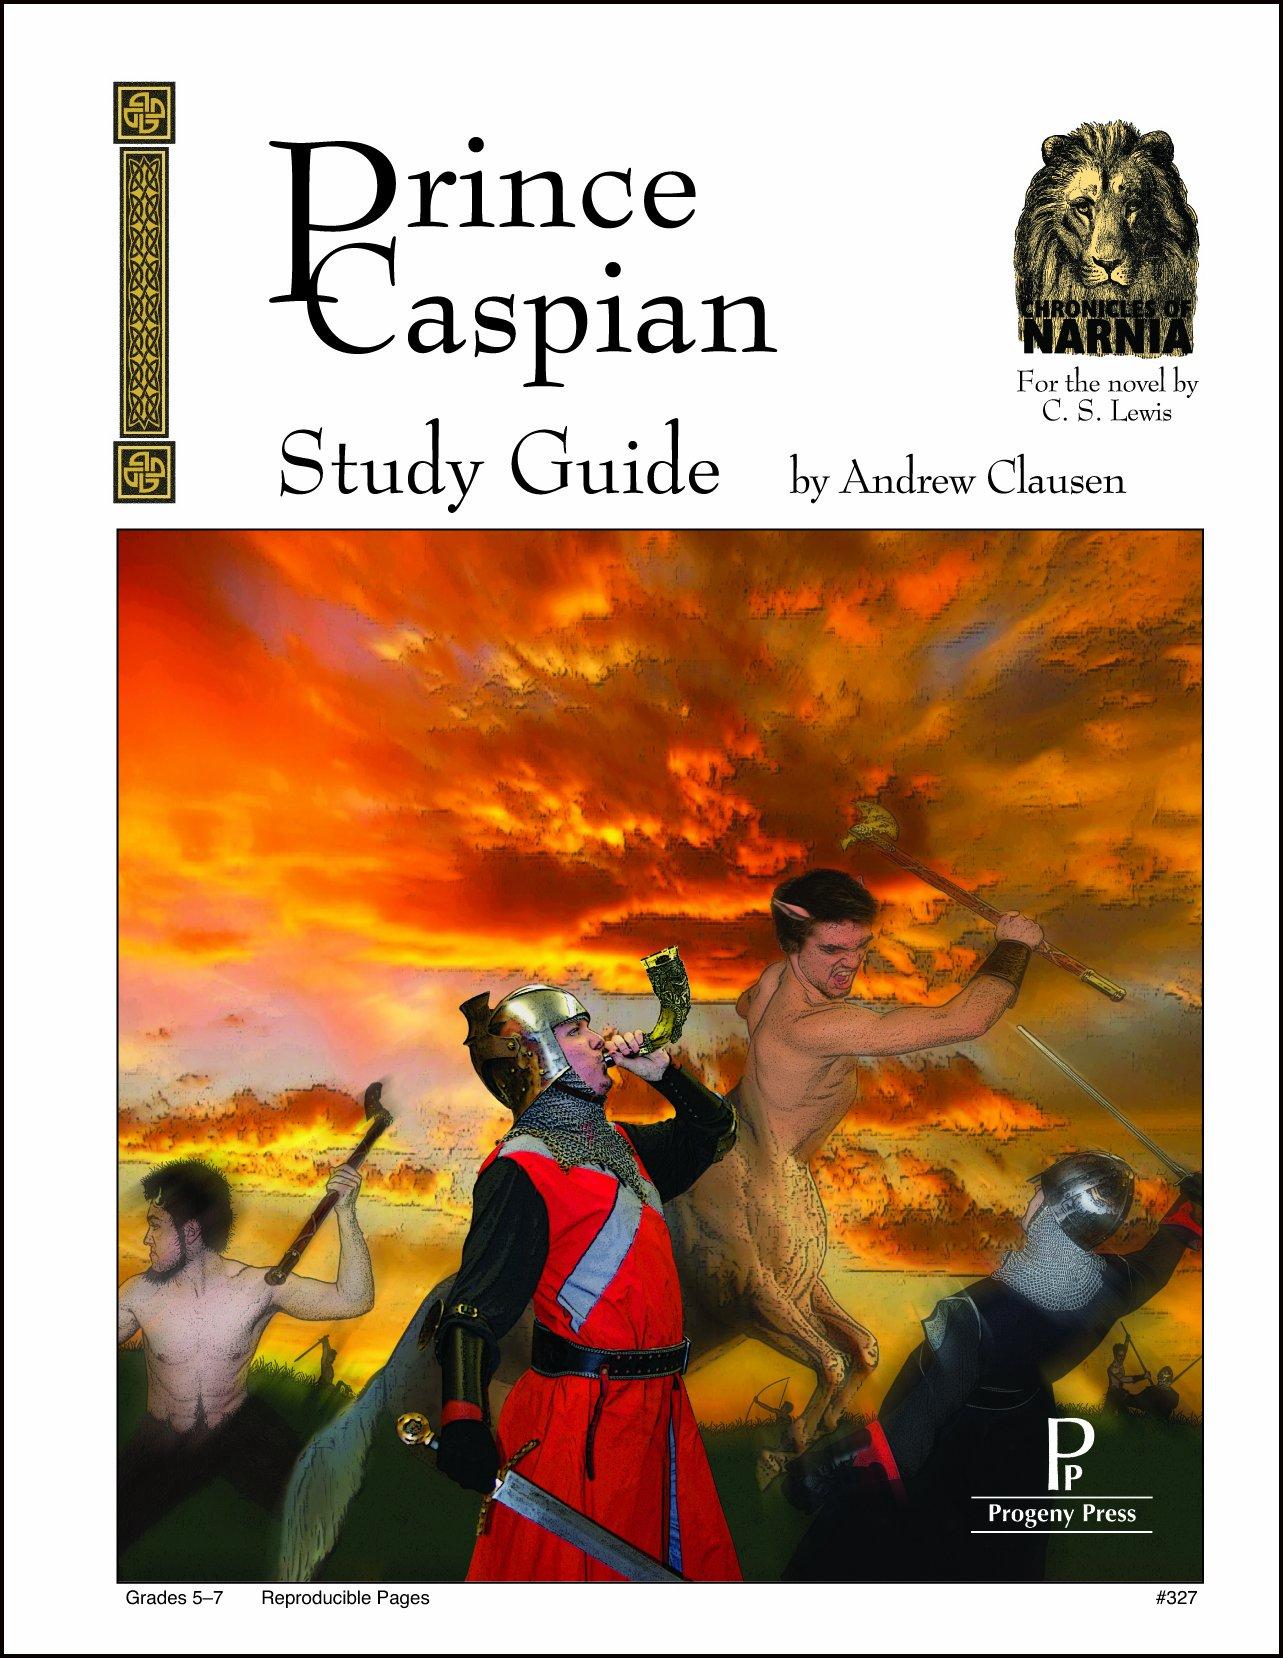 Prince Caspian Study Guide: Andrew Clausen: 9781586093464: Amazon.com: Books